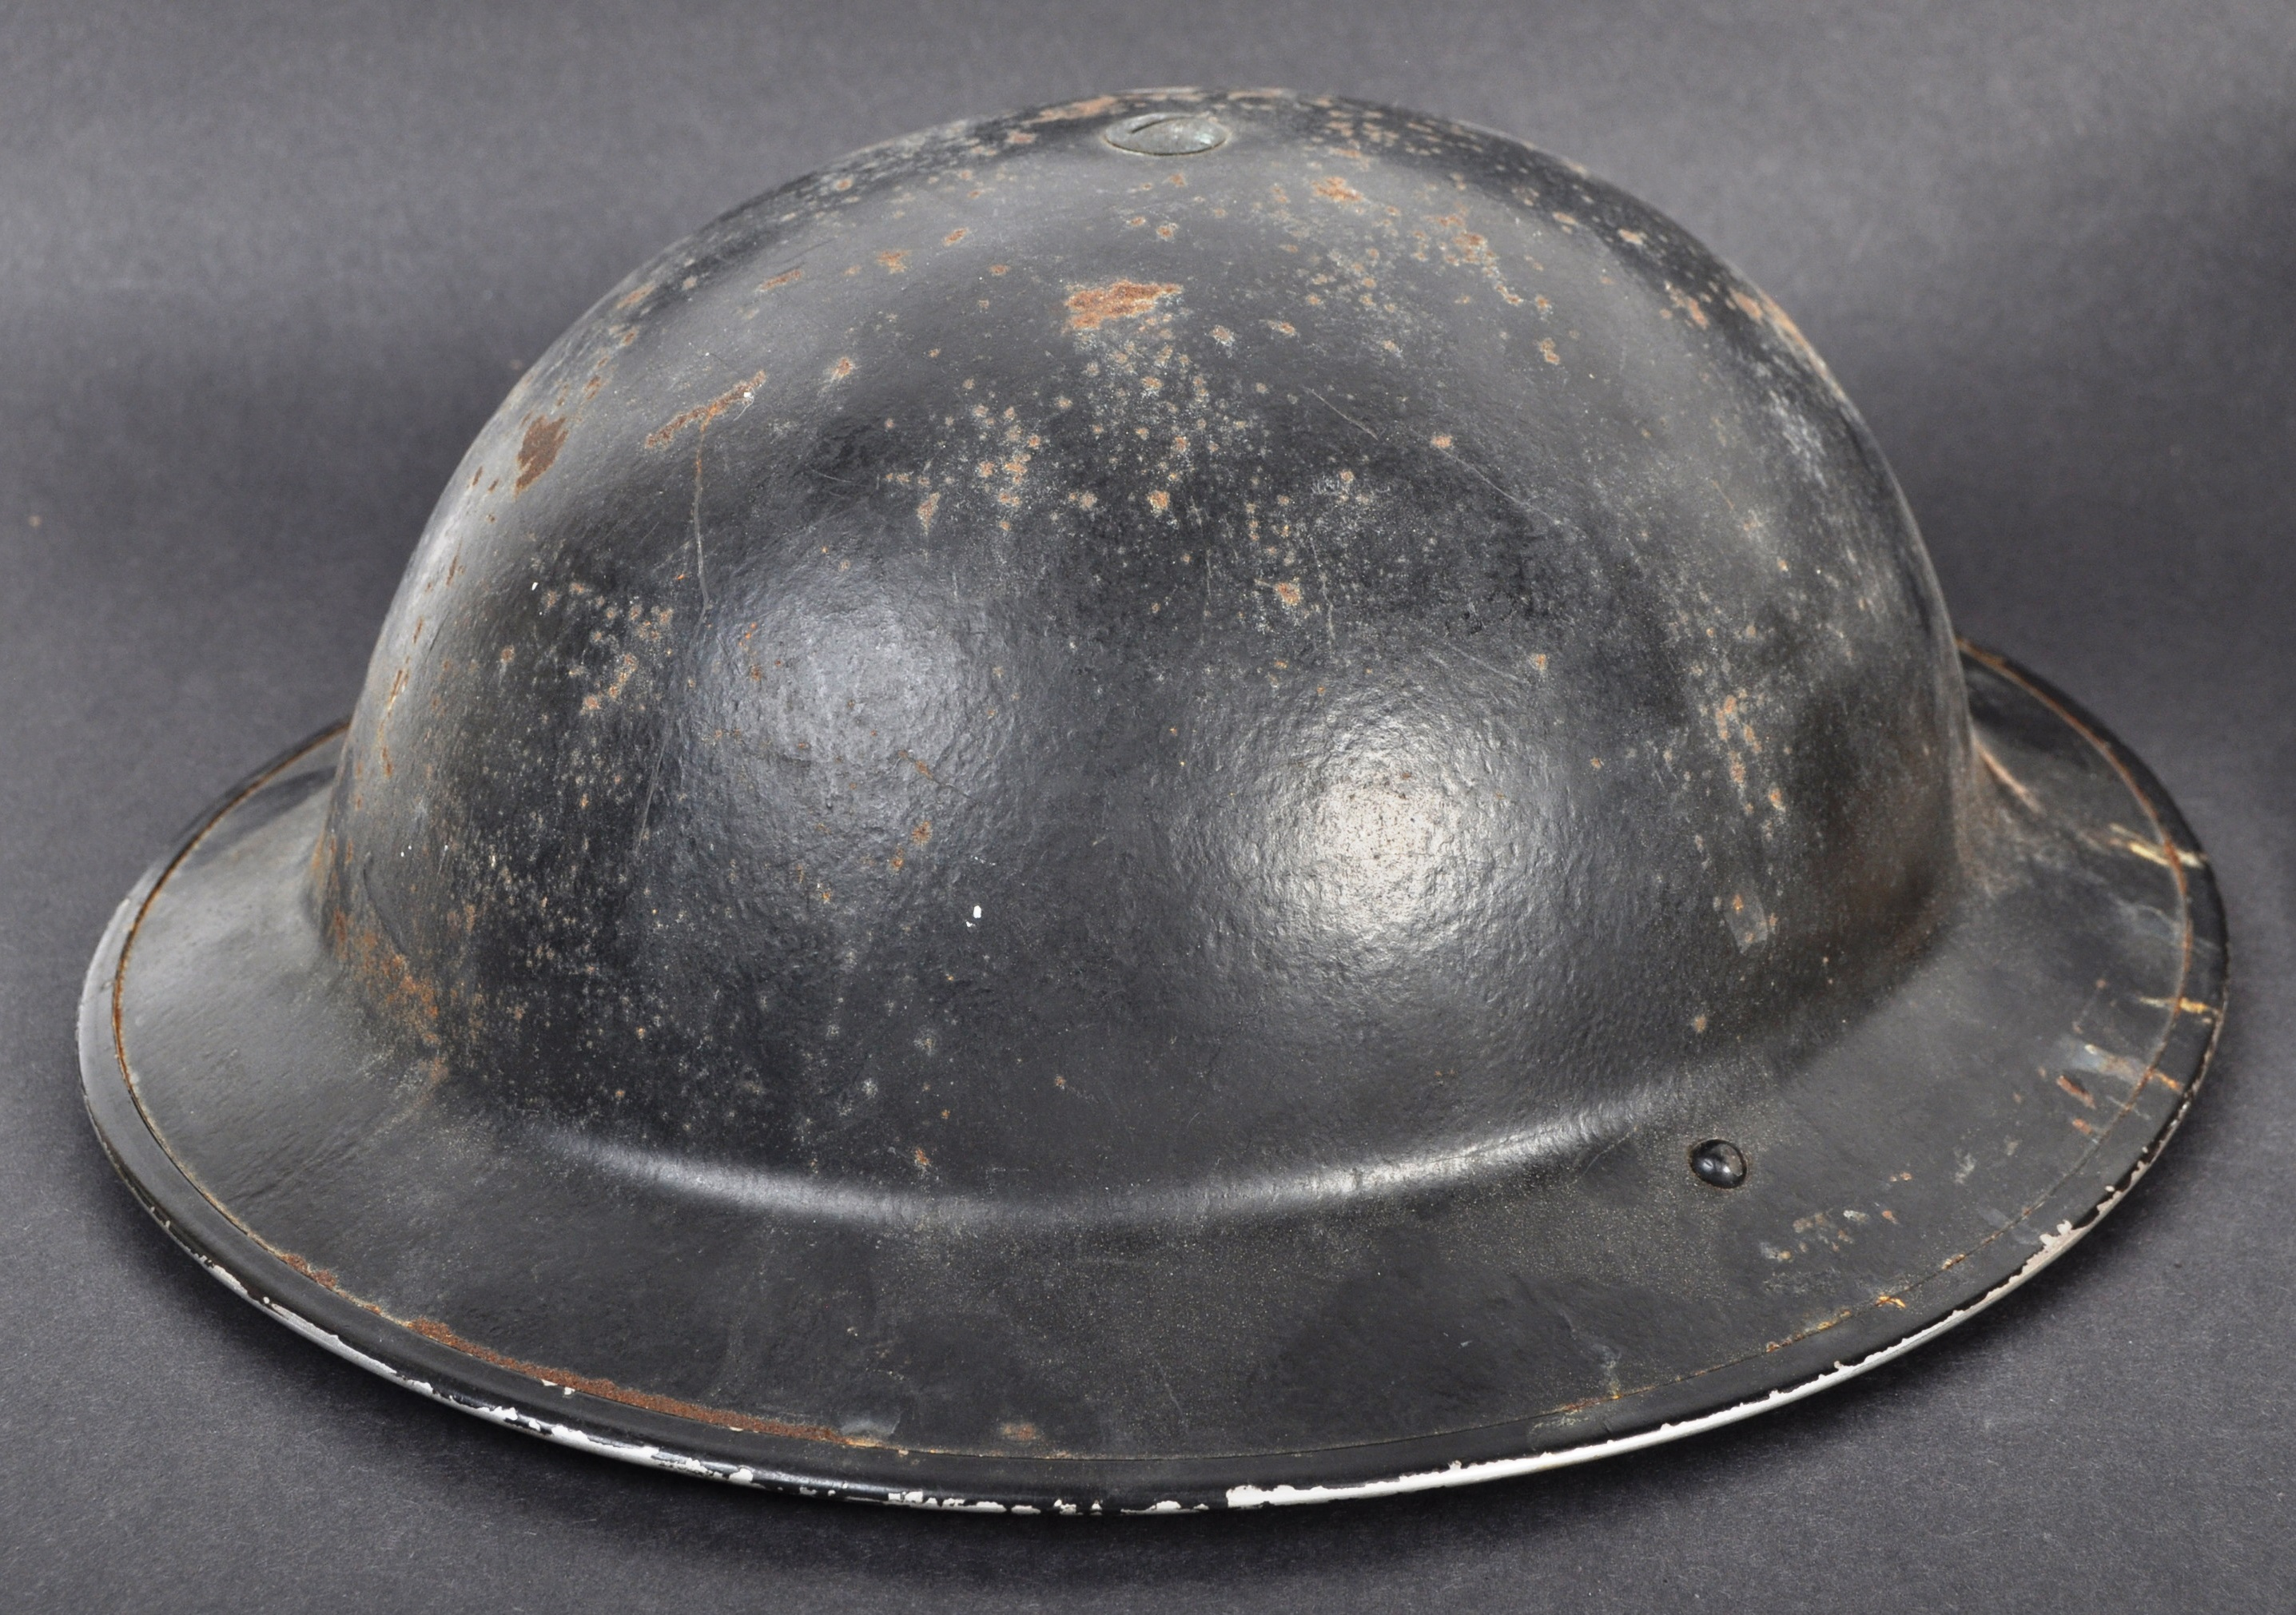 TWO ORIGINAL WWII SECOND WORLD WAR BRITISH COMBAT HELMETS - Image 2 of 7